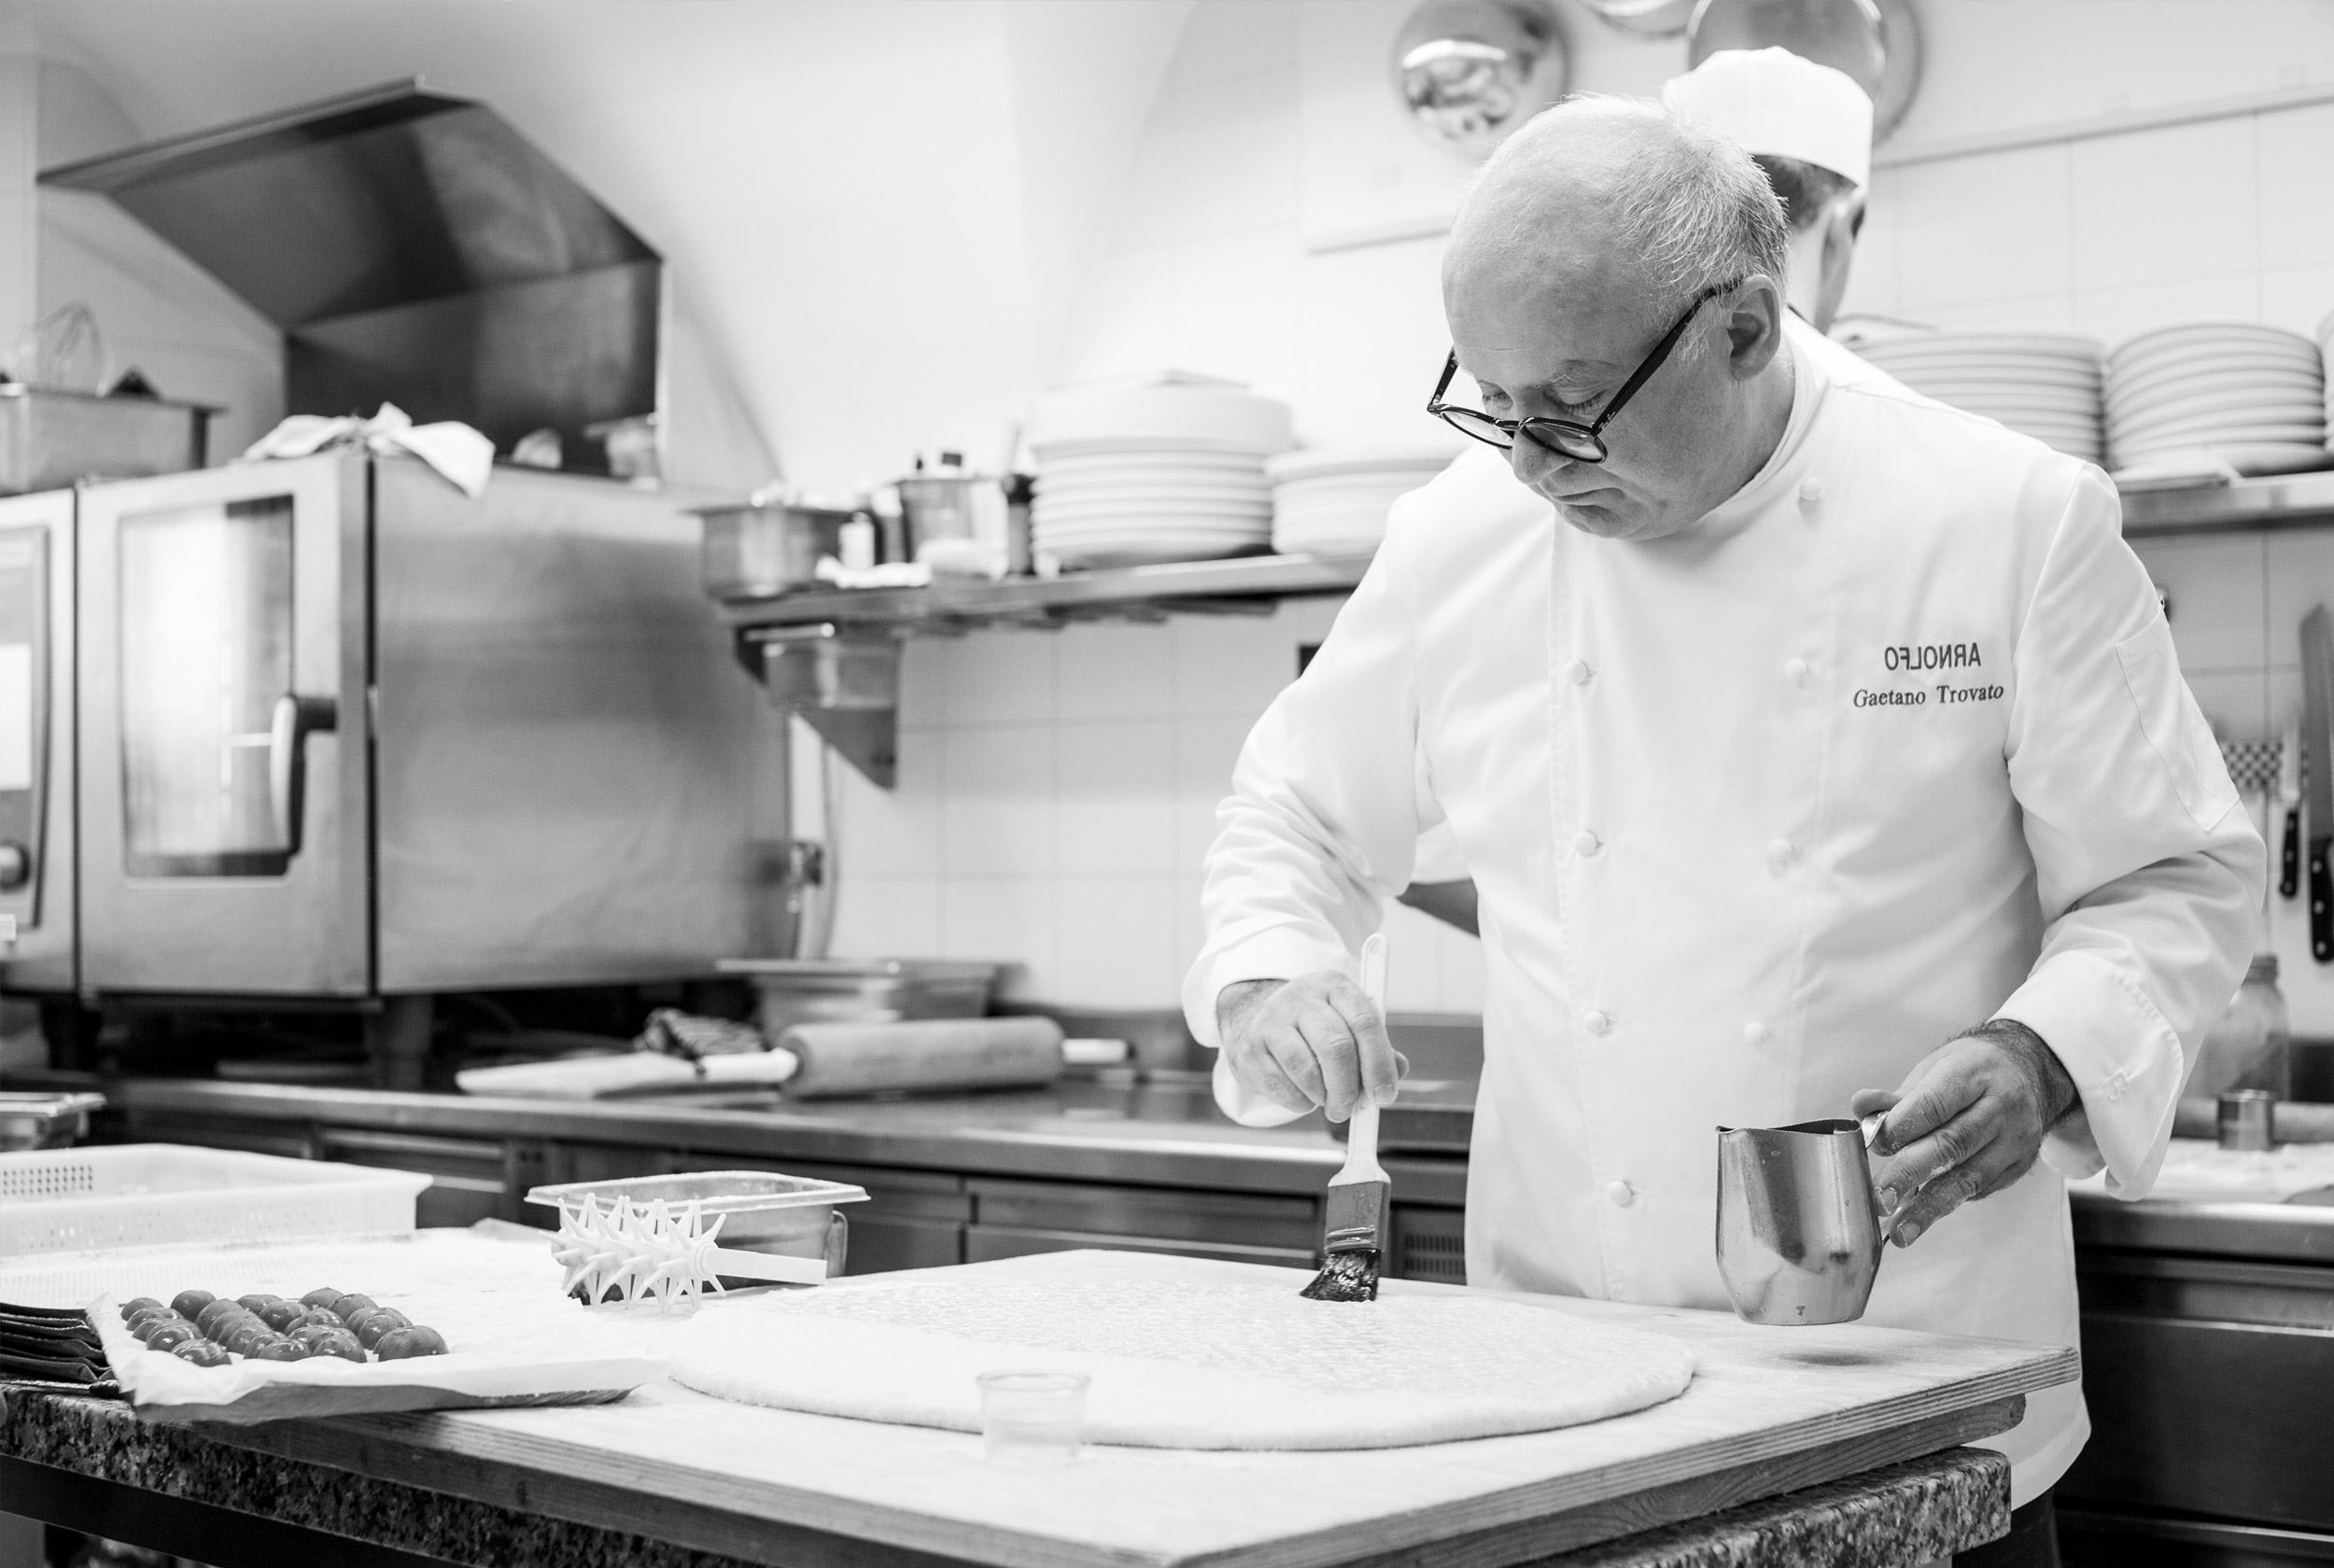 Gaetano Trovato Chef